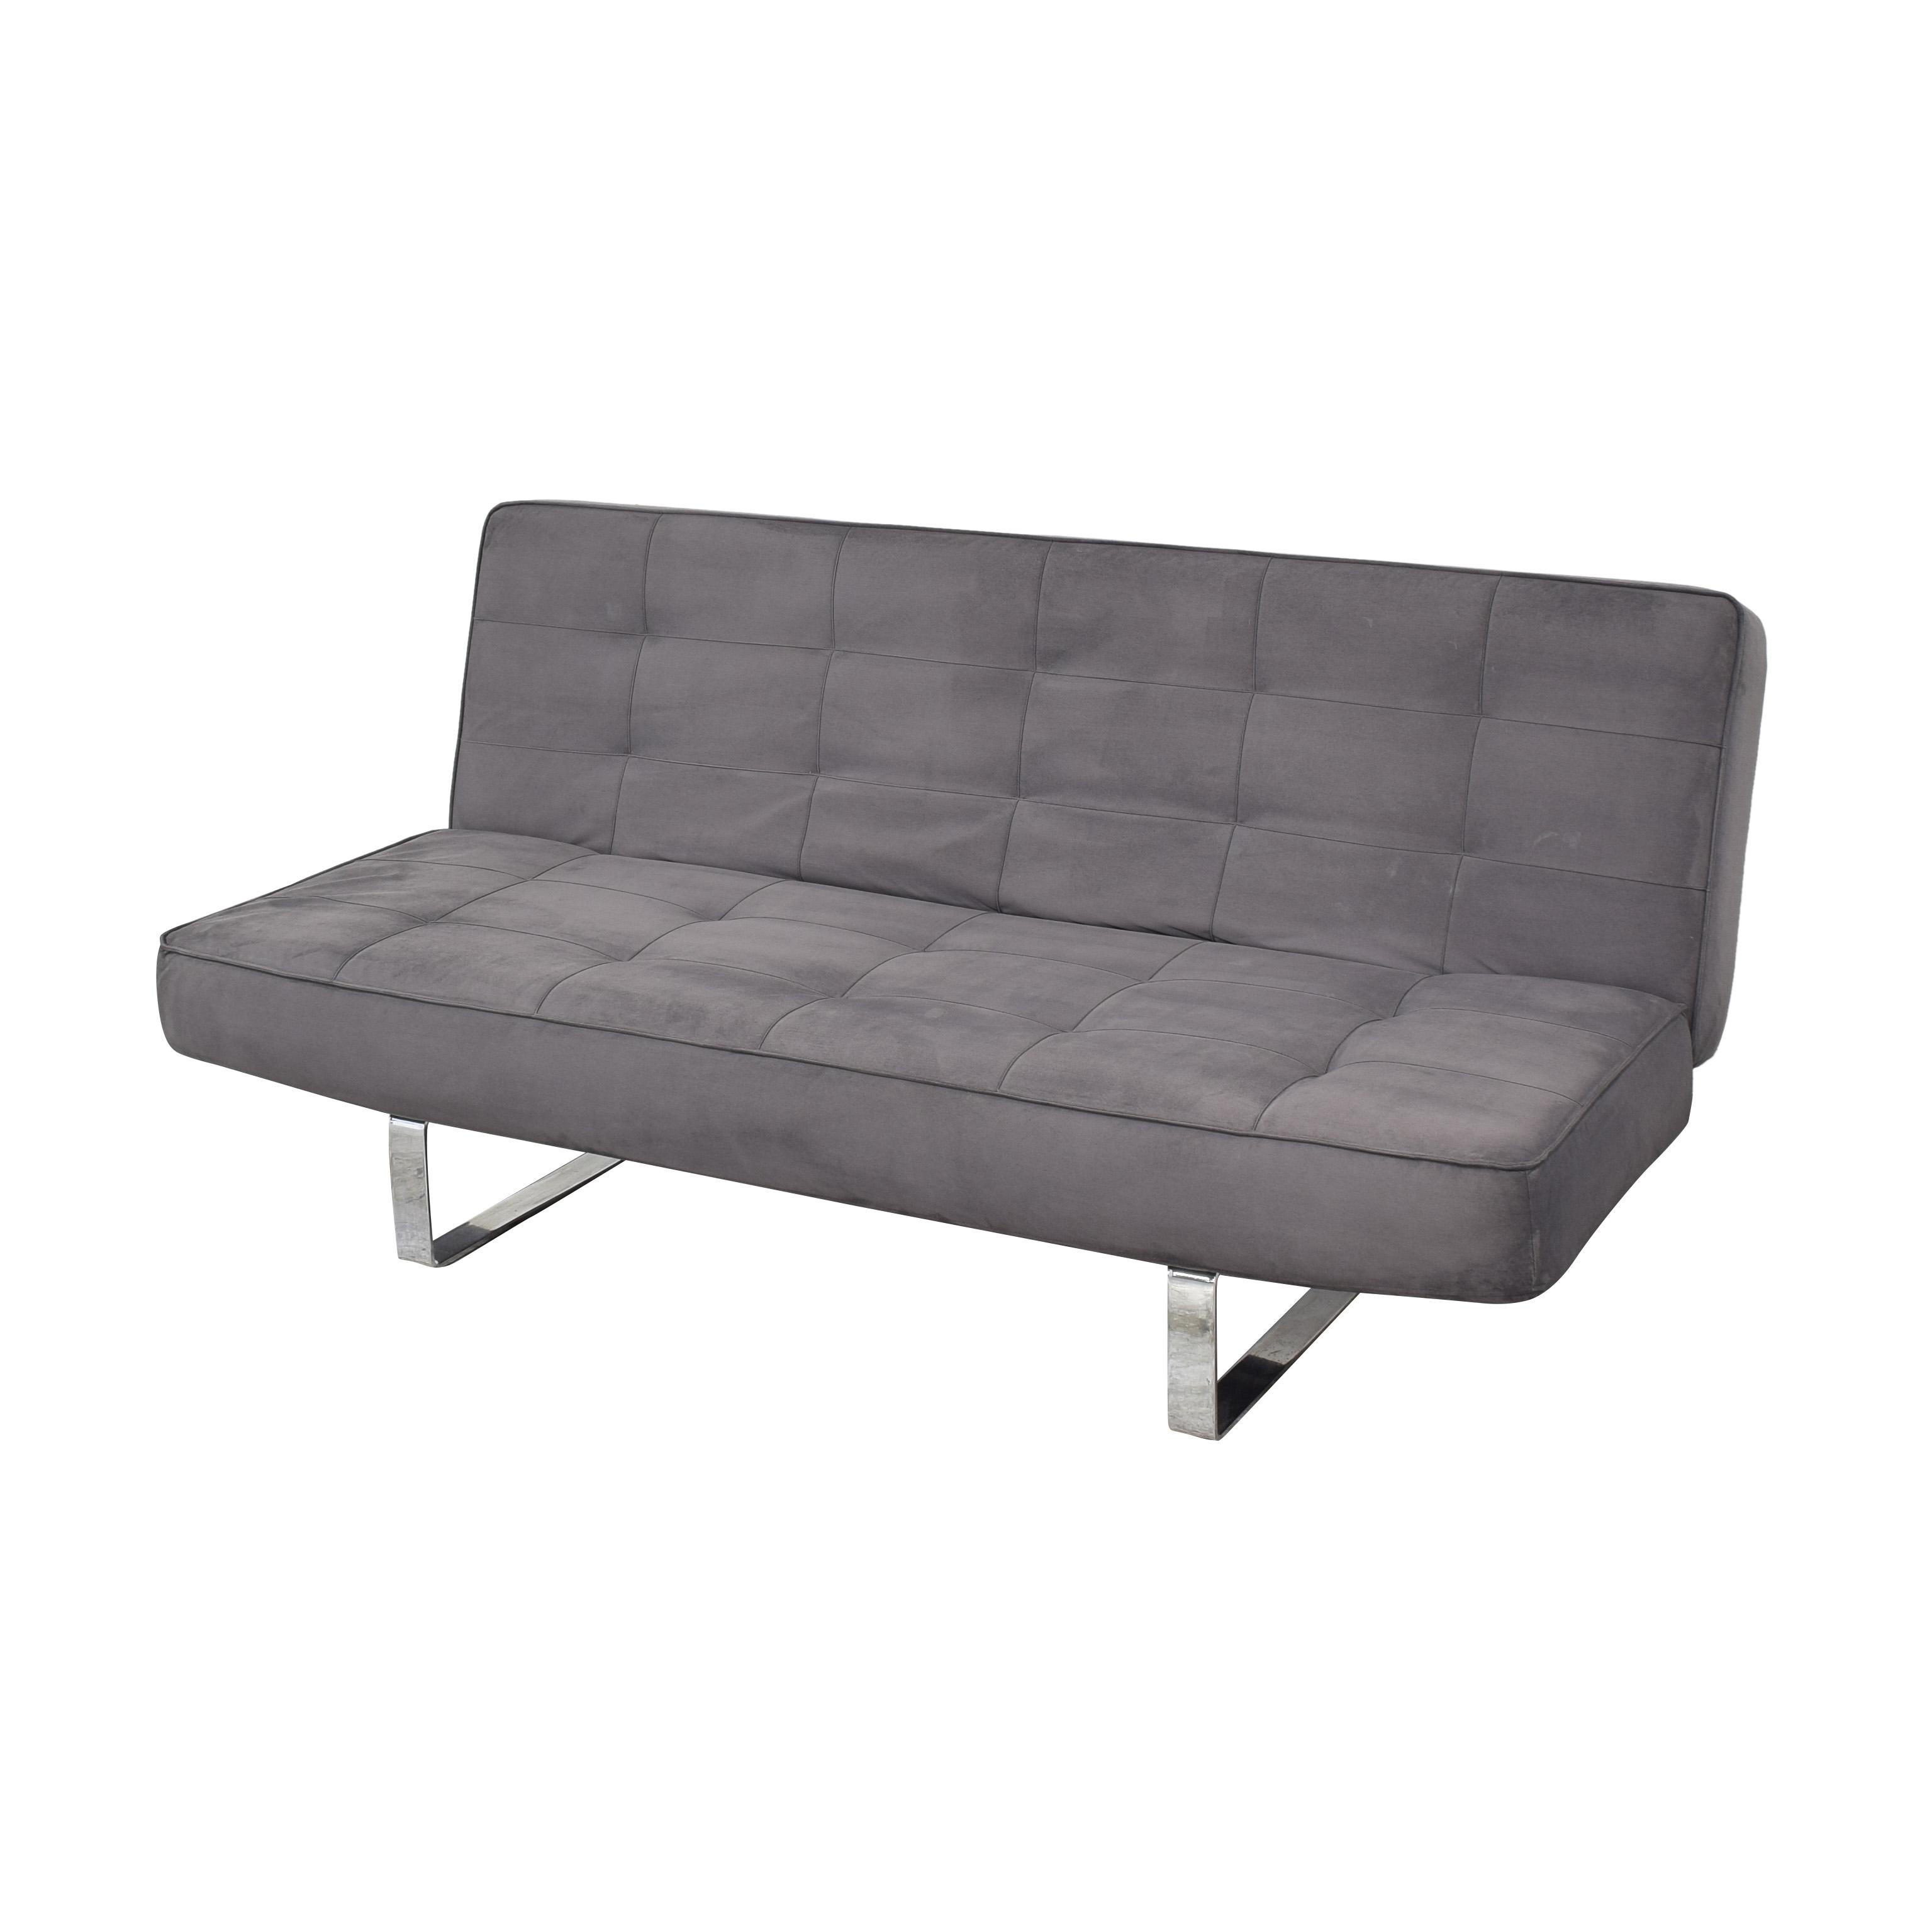 BoConcept BoConcept Sleeper Sofa Bed pa